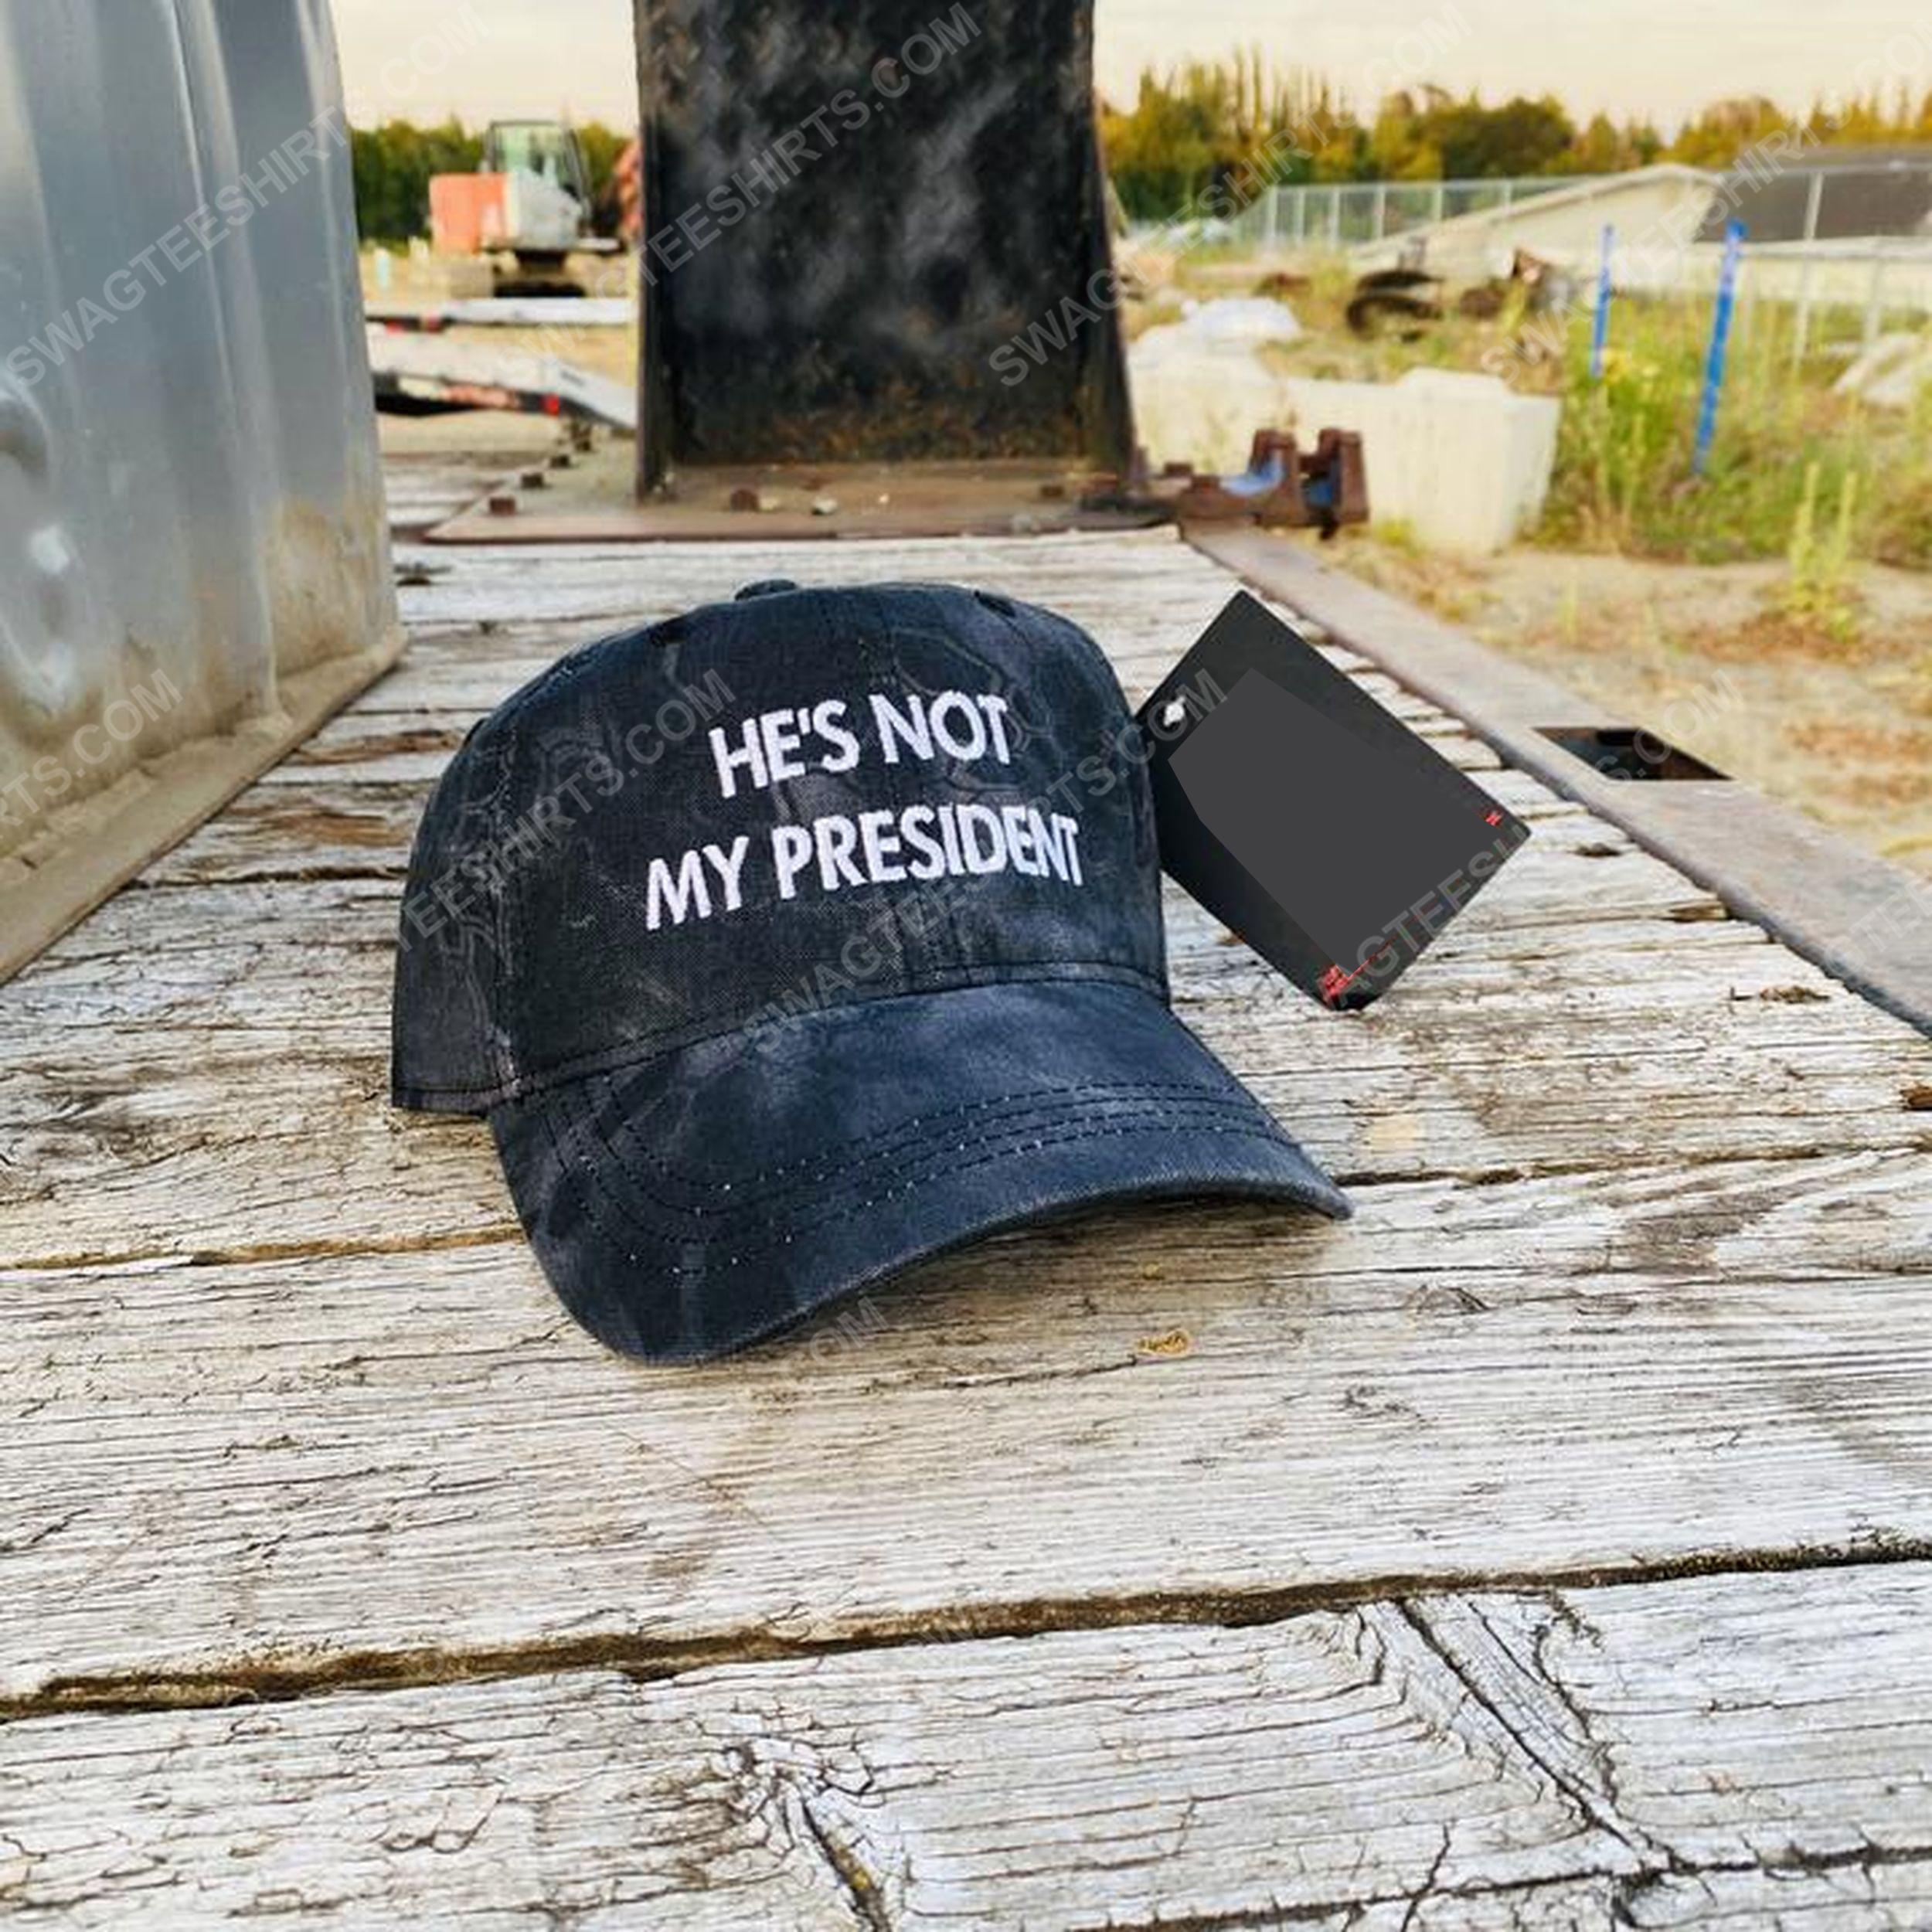 He's not my president full print classic hat 1